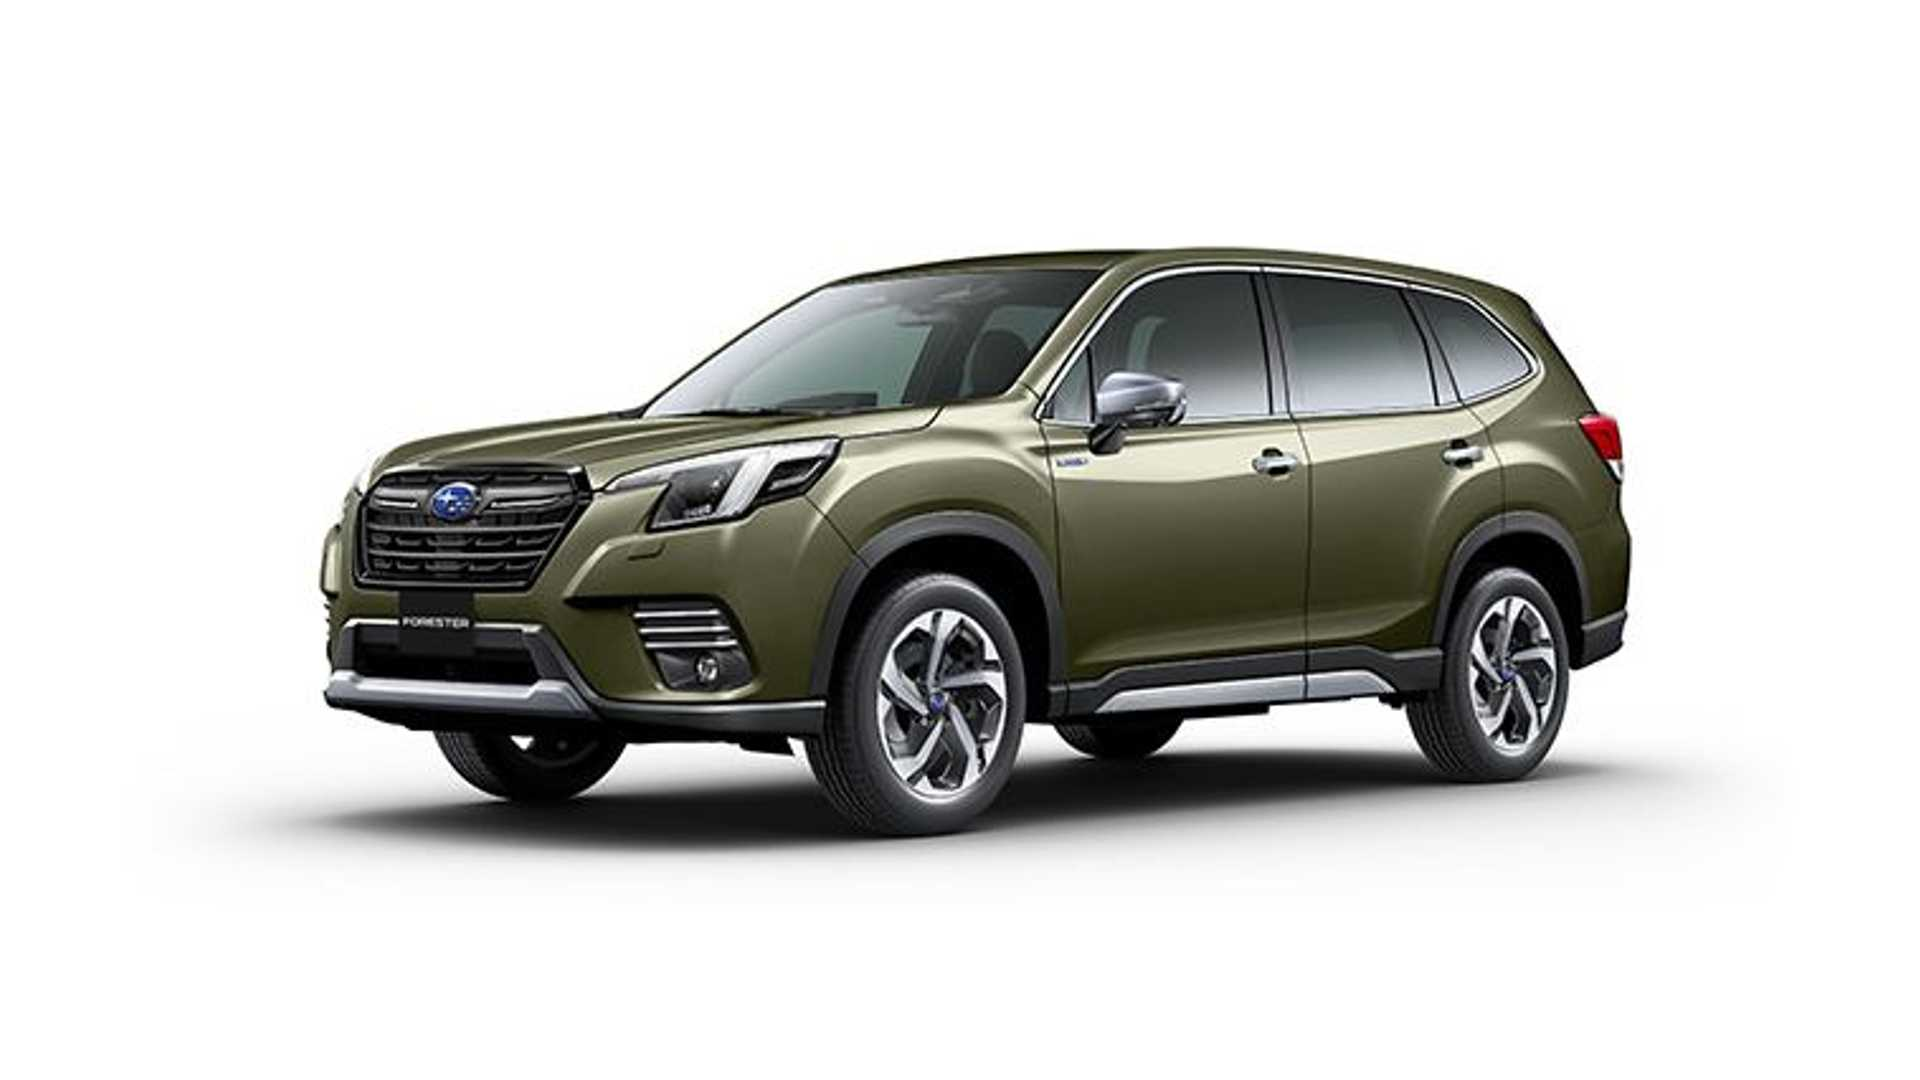 Subaru-Forester-facelift-30